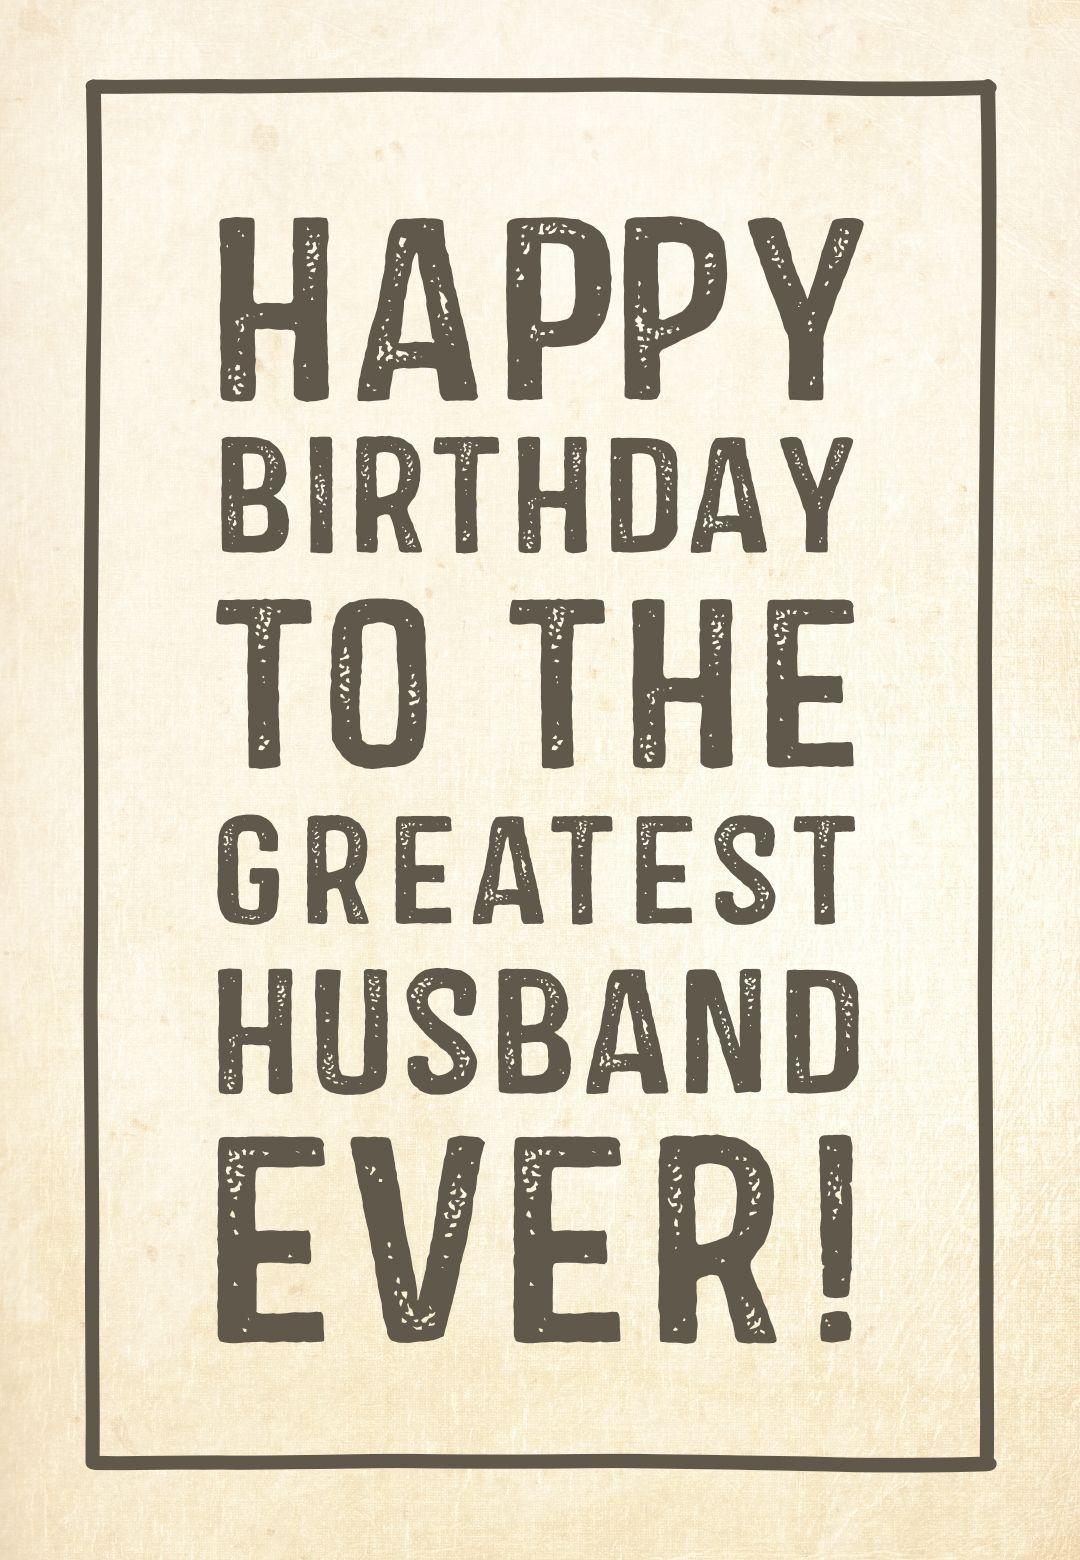 Free Printable Birthday Card - Greatest Husband | Greetings Island - Free Printable Birthday Cards For Husband